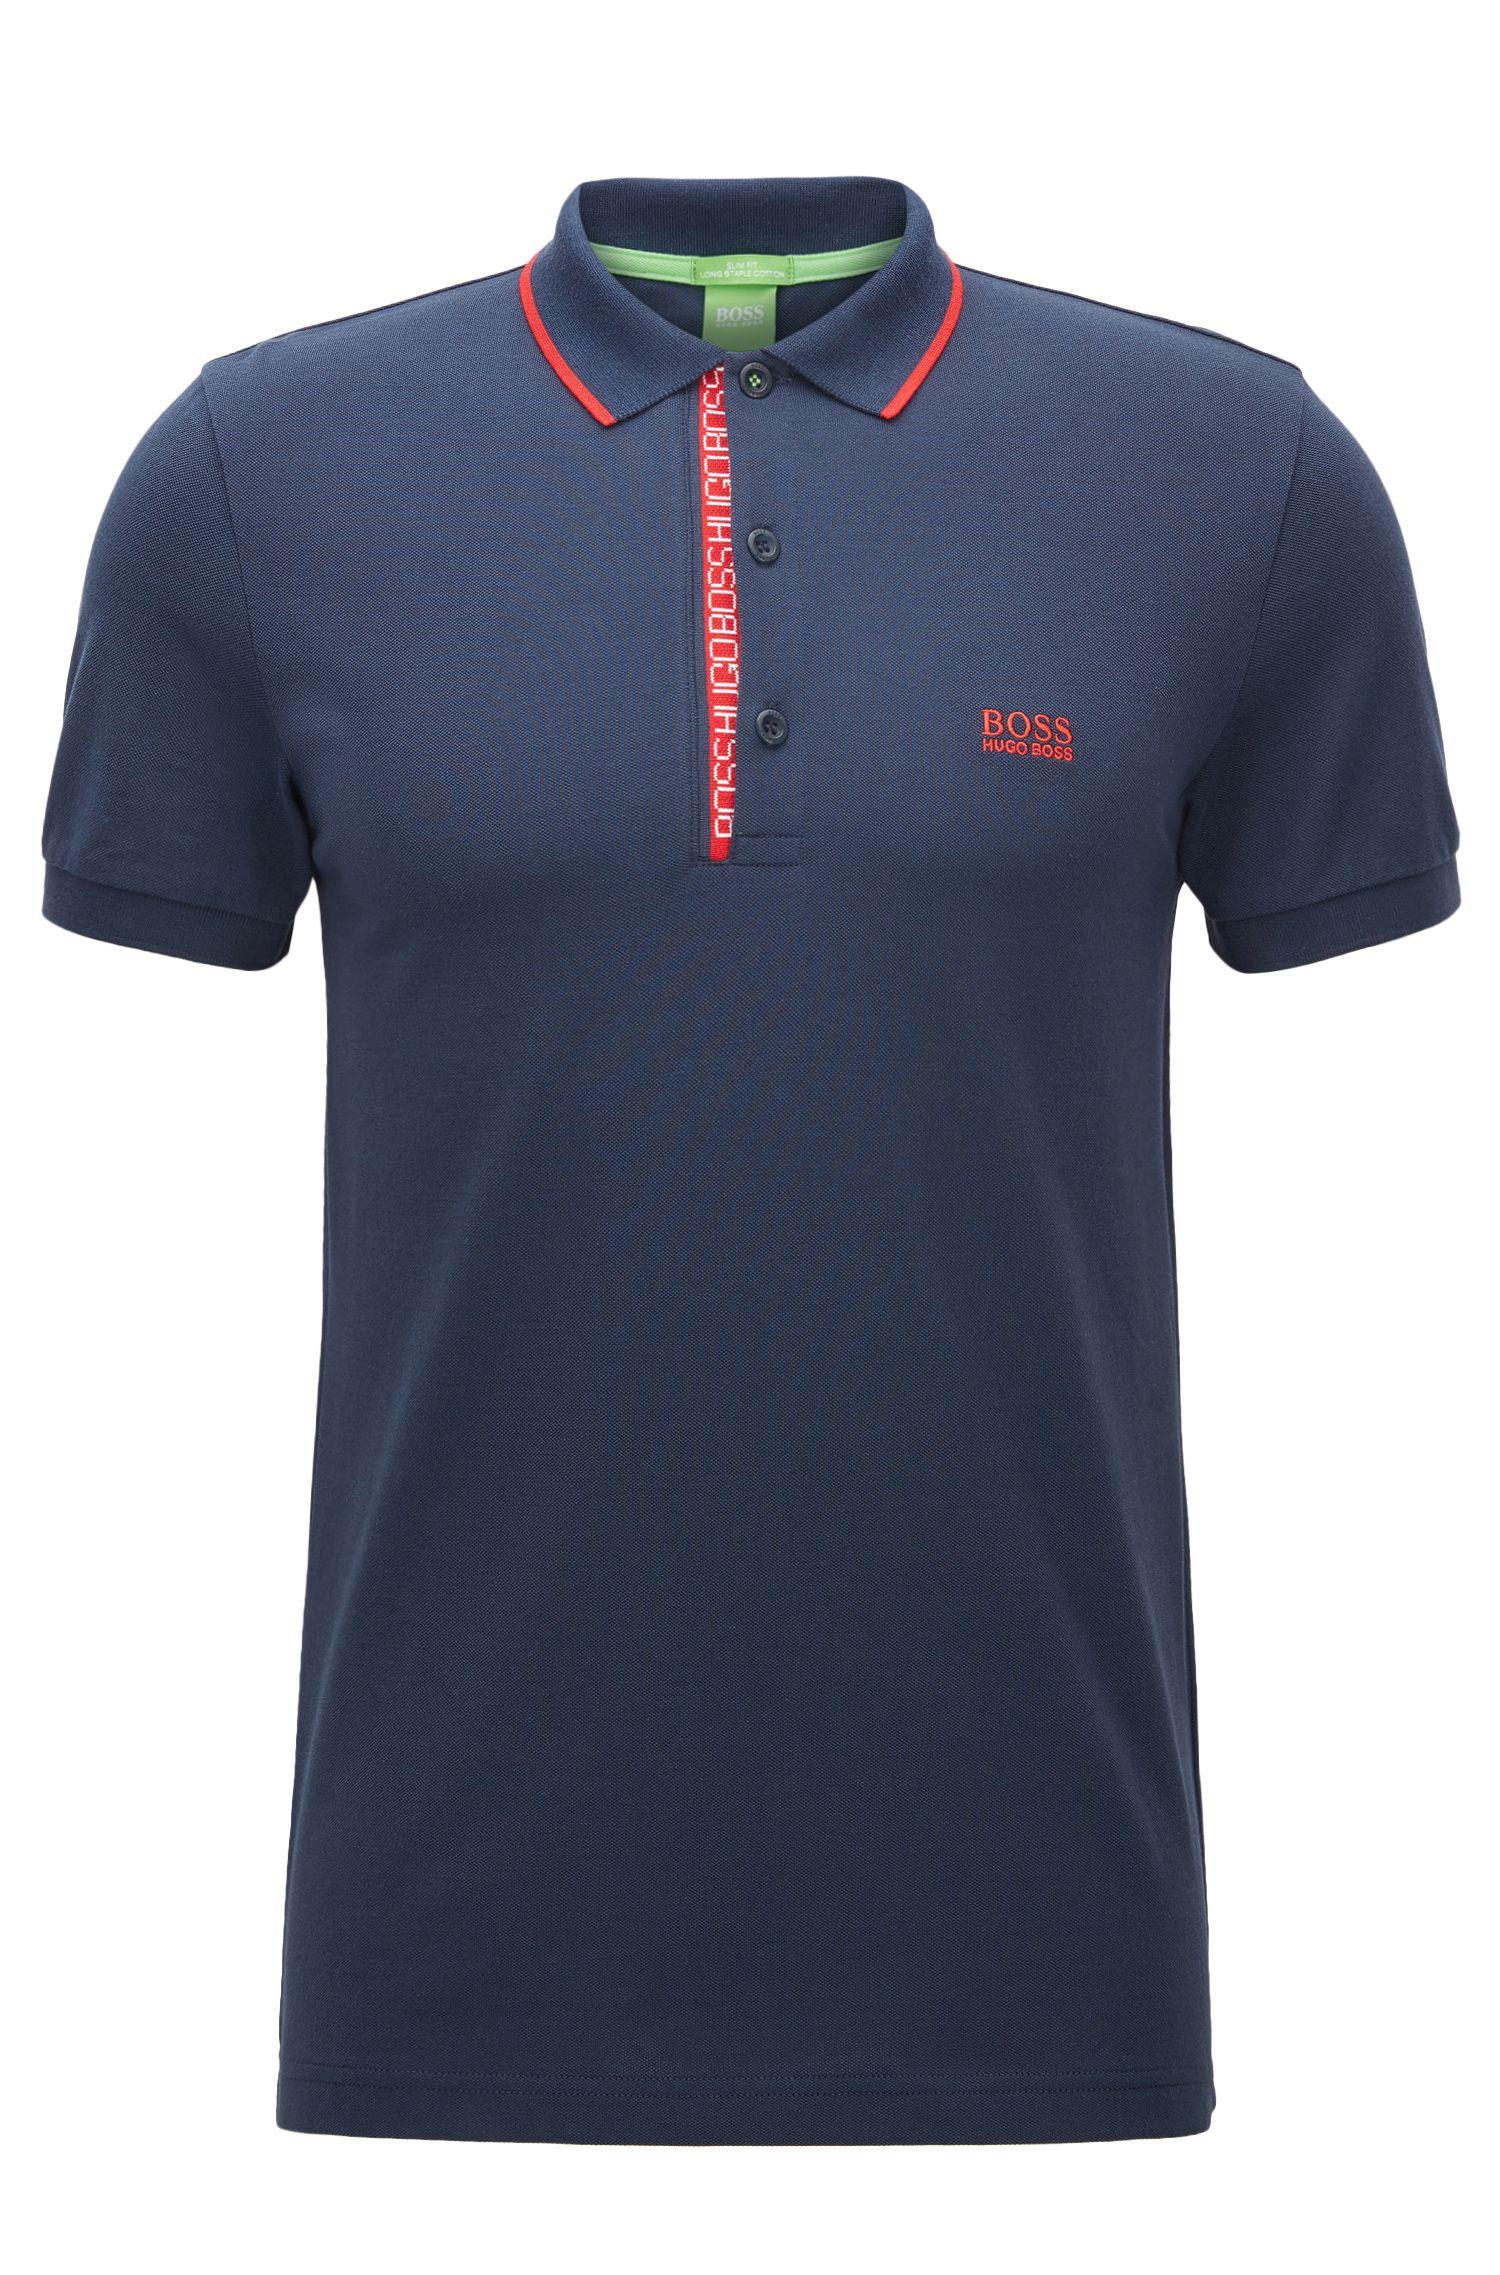 Slim-fit logo polo shirt in cotton piqué